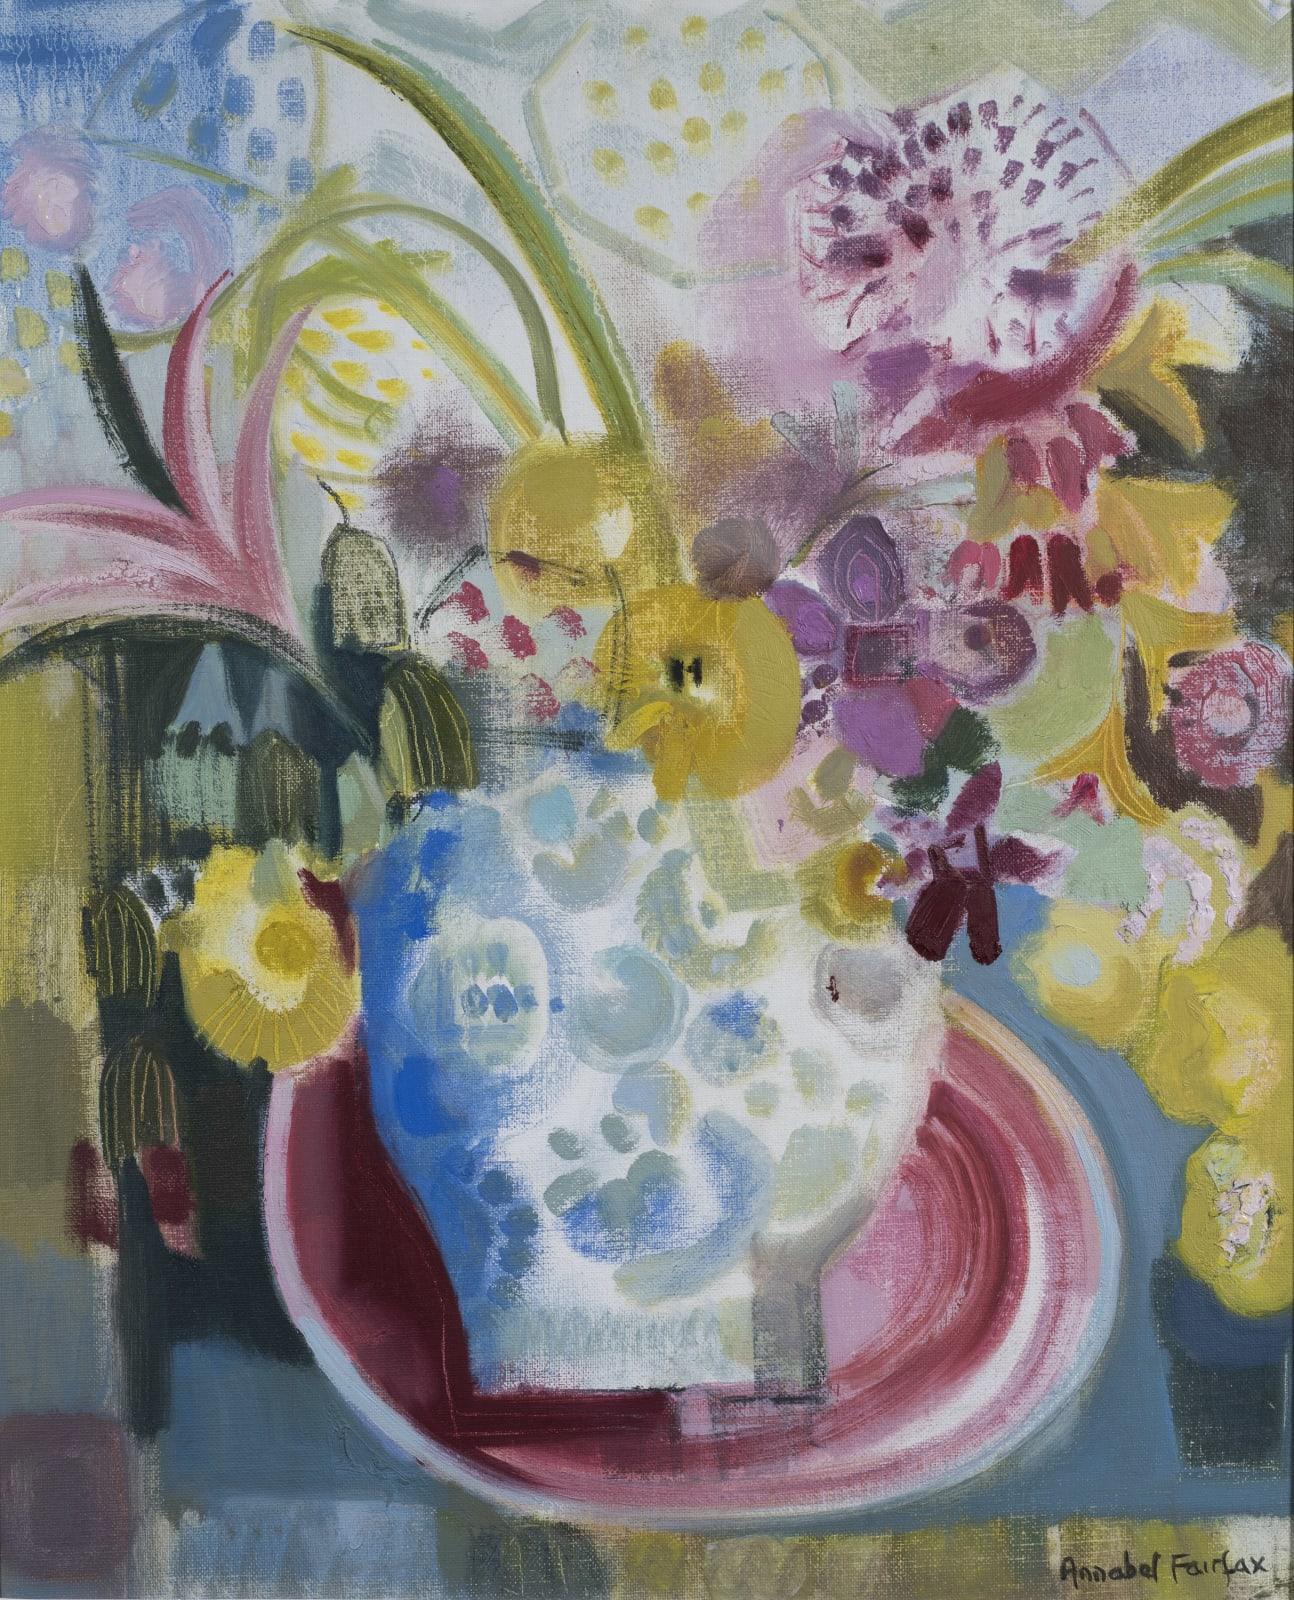 Annabel Fairfax, Urn and Oval Platter